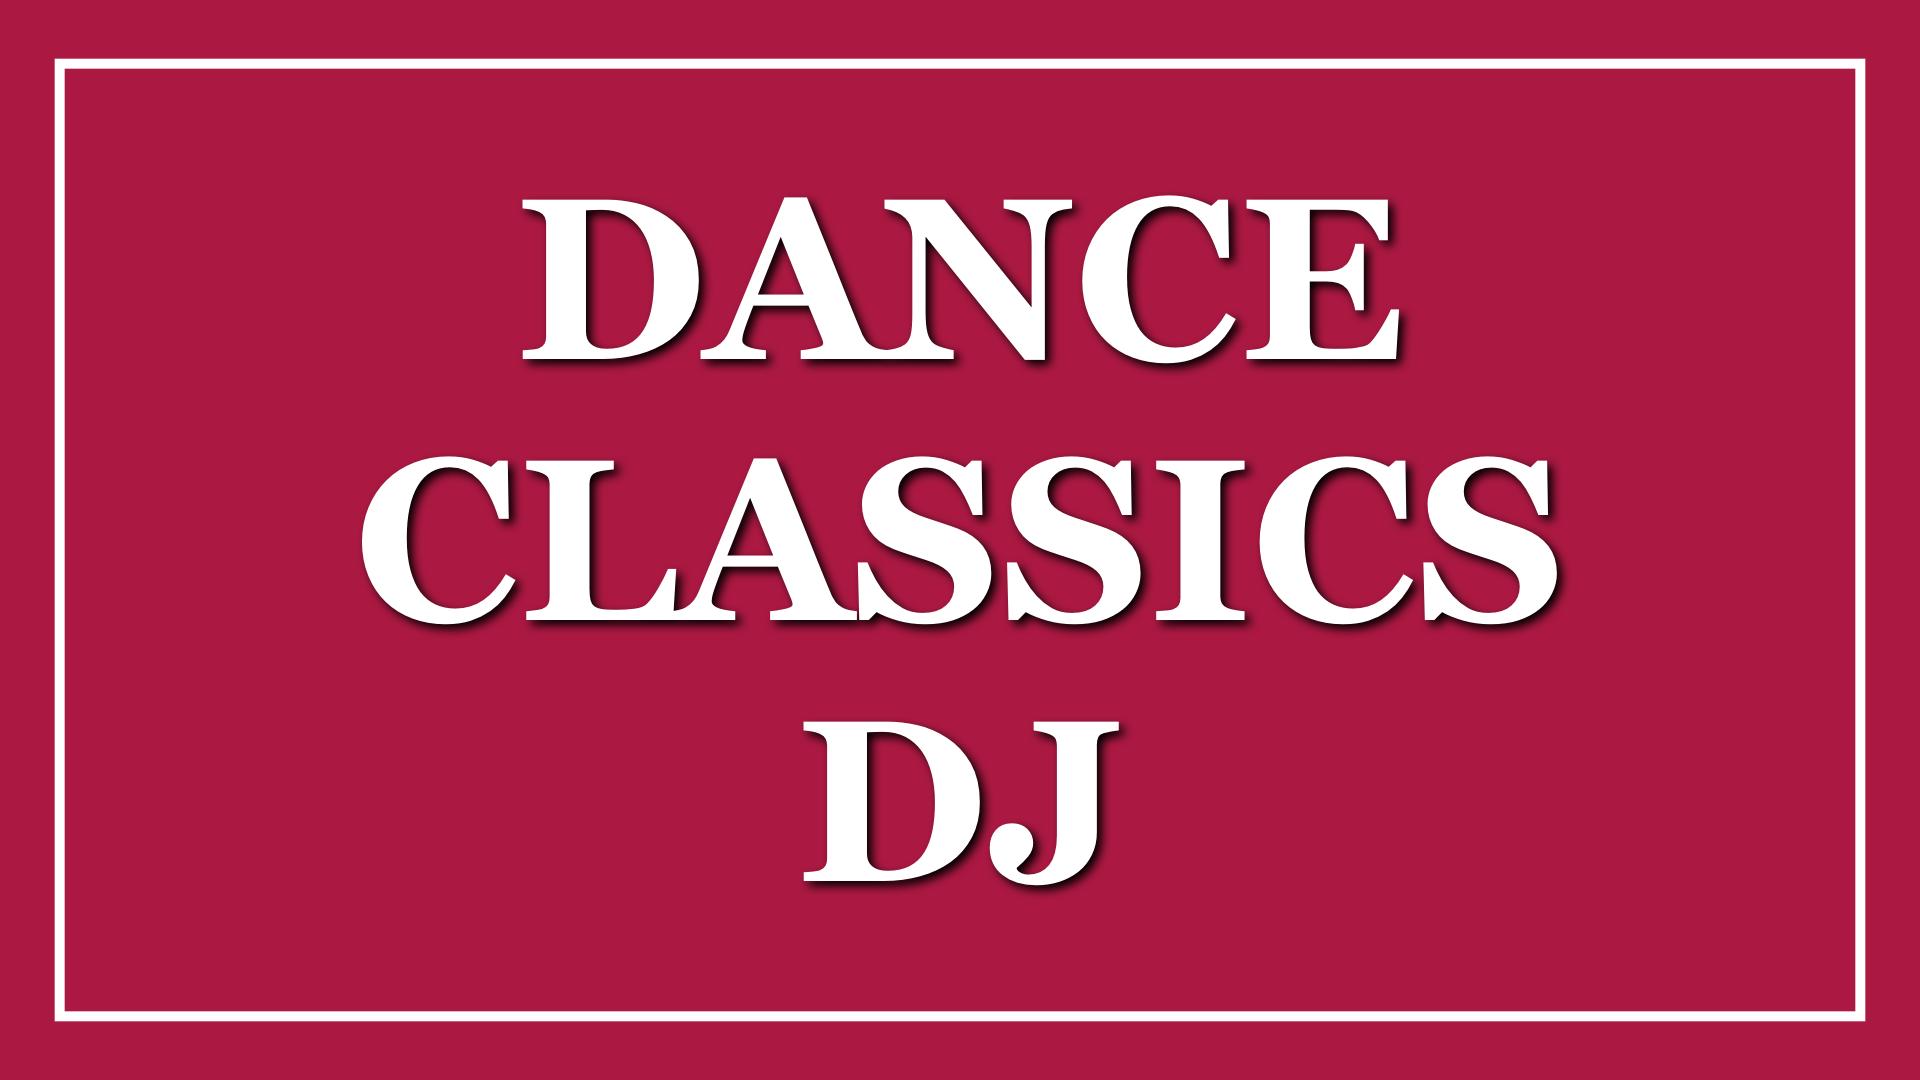 Dance Classics DJ